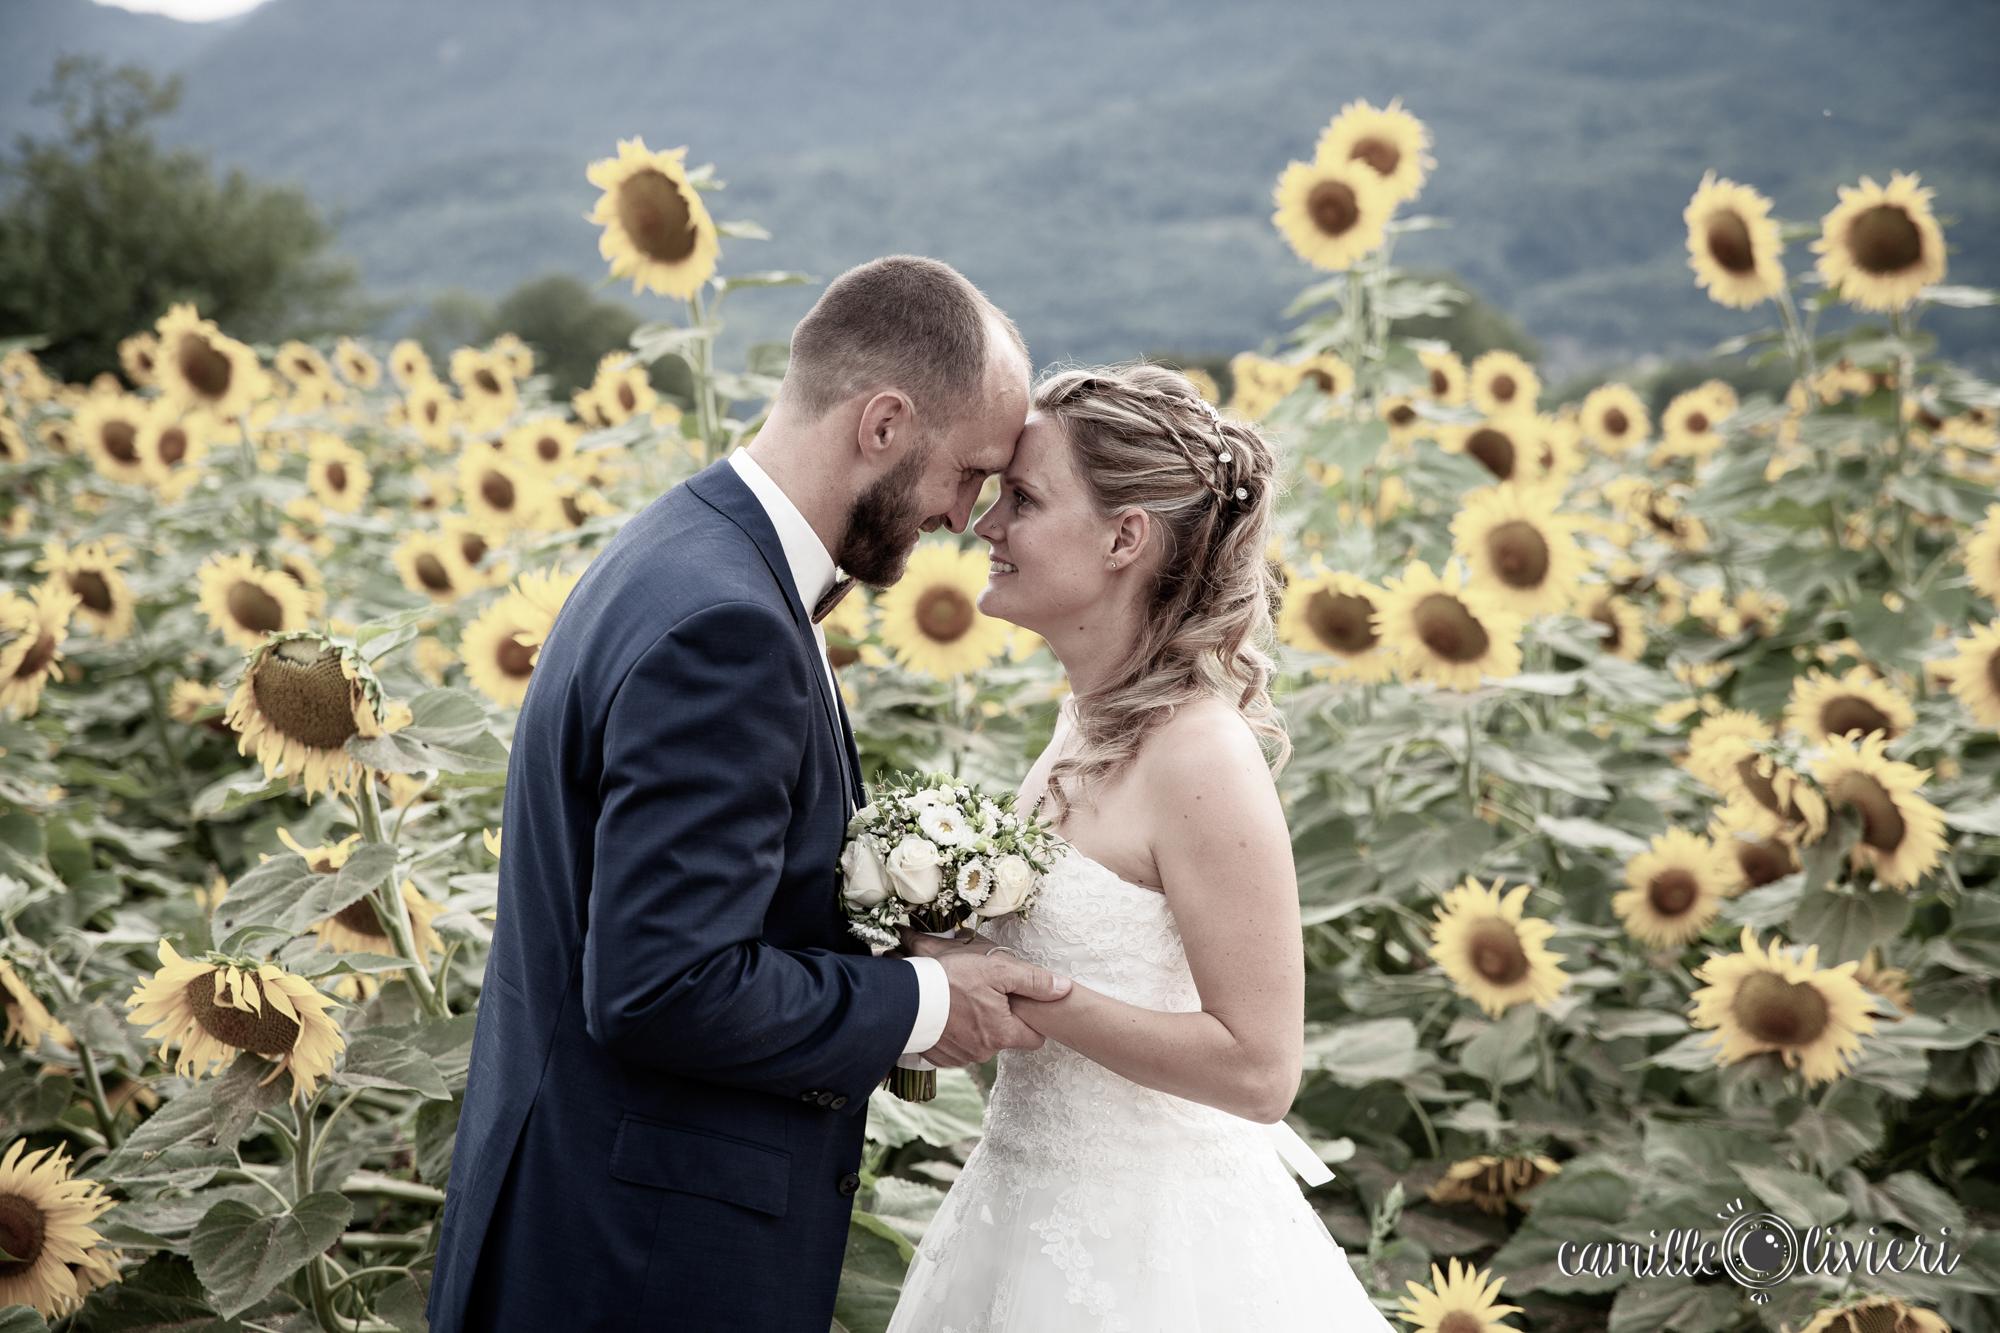 photographe_grenoble_mariage-camille-olivieri-123